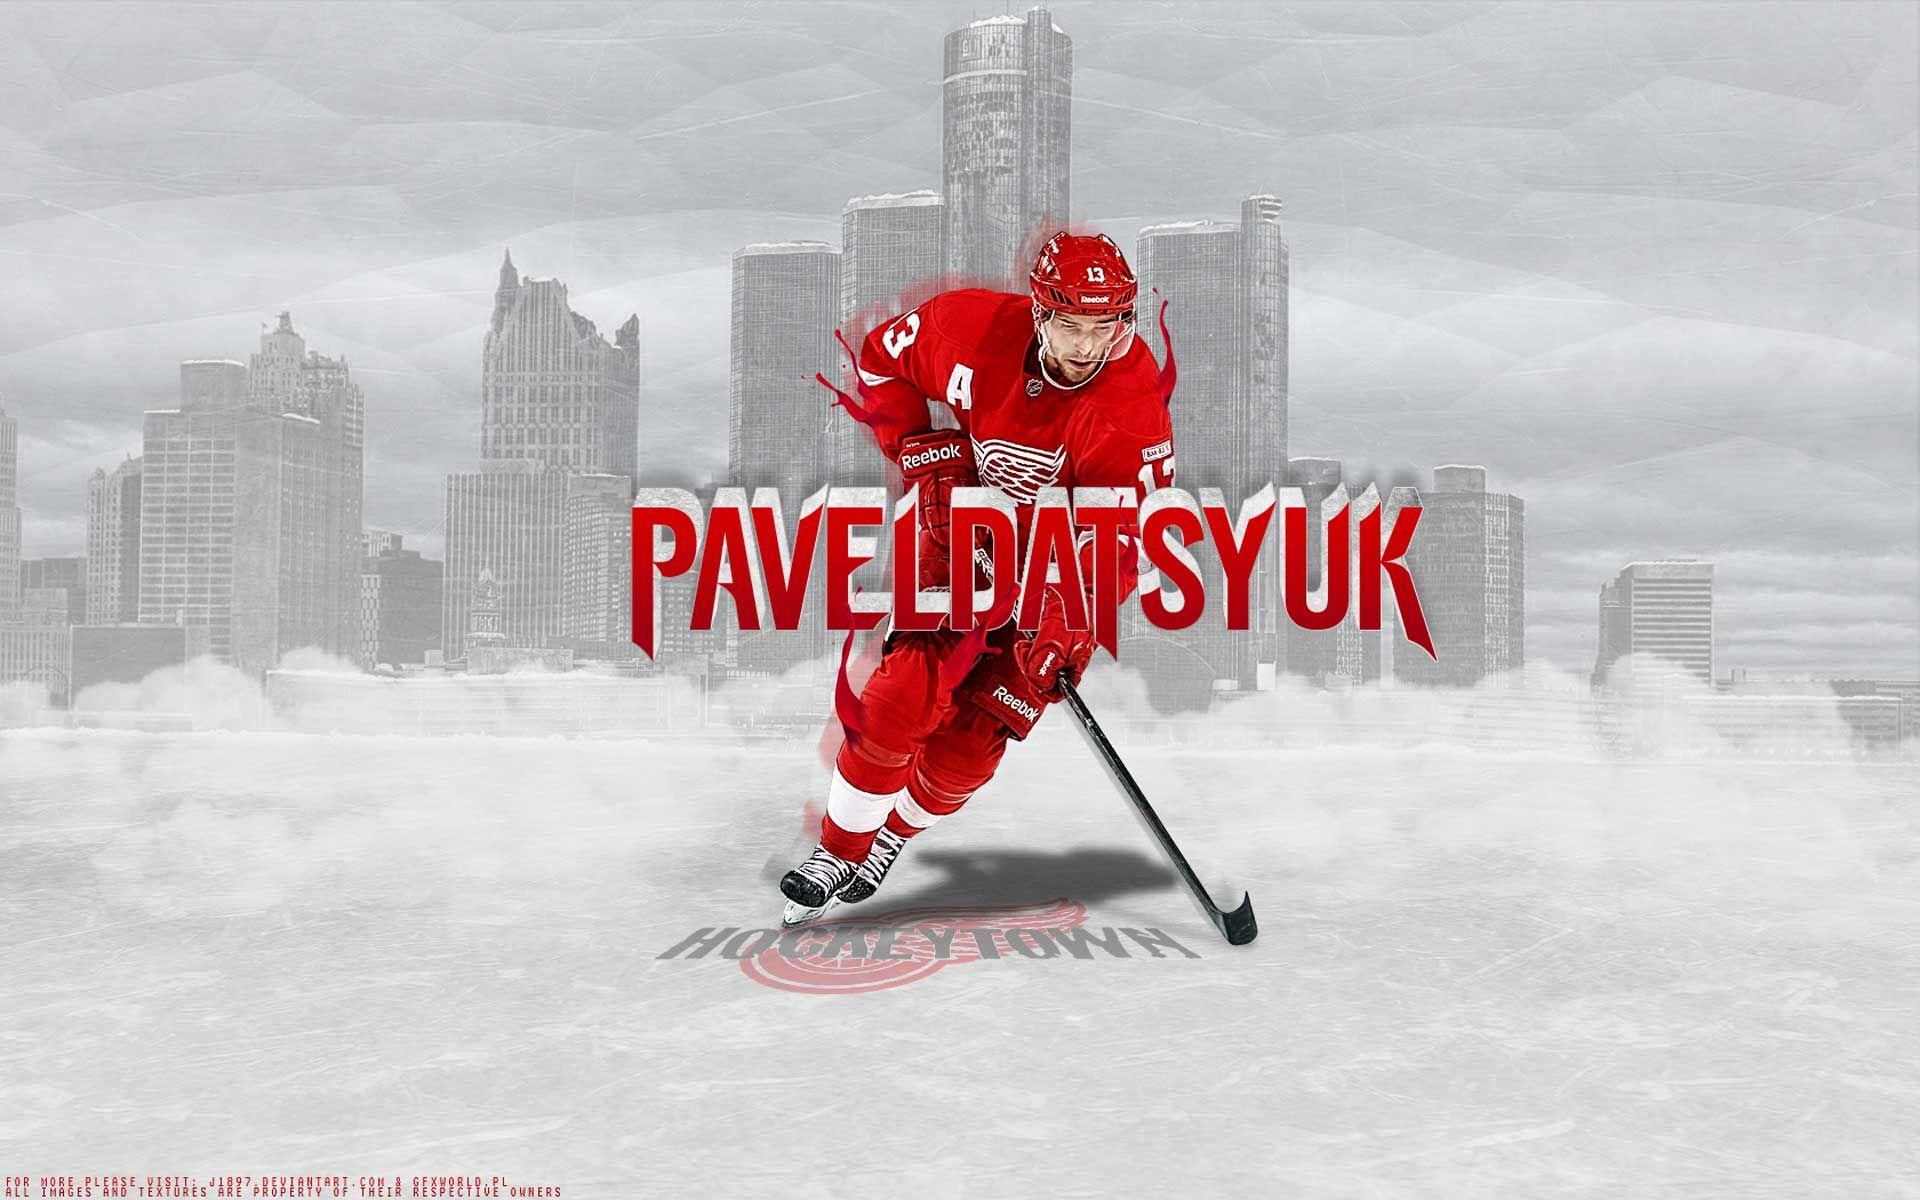 Hockey nhl dat detroit red wings pavel datsyuk wallpaper 25451 1920x1200